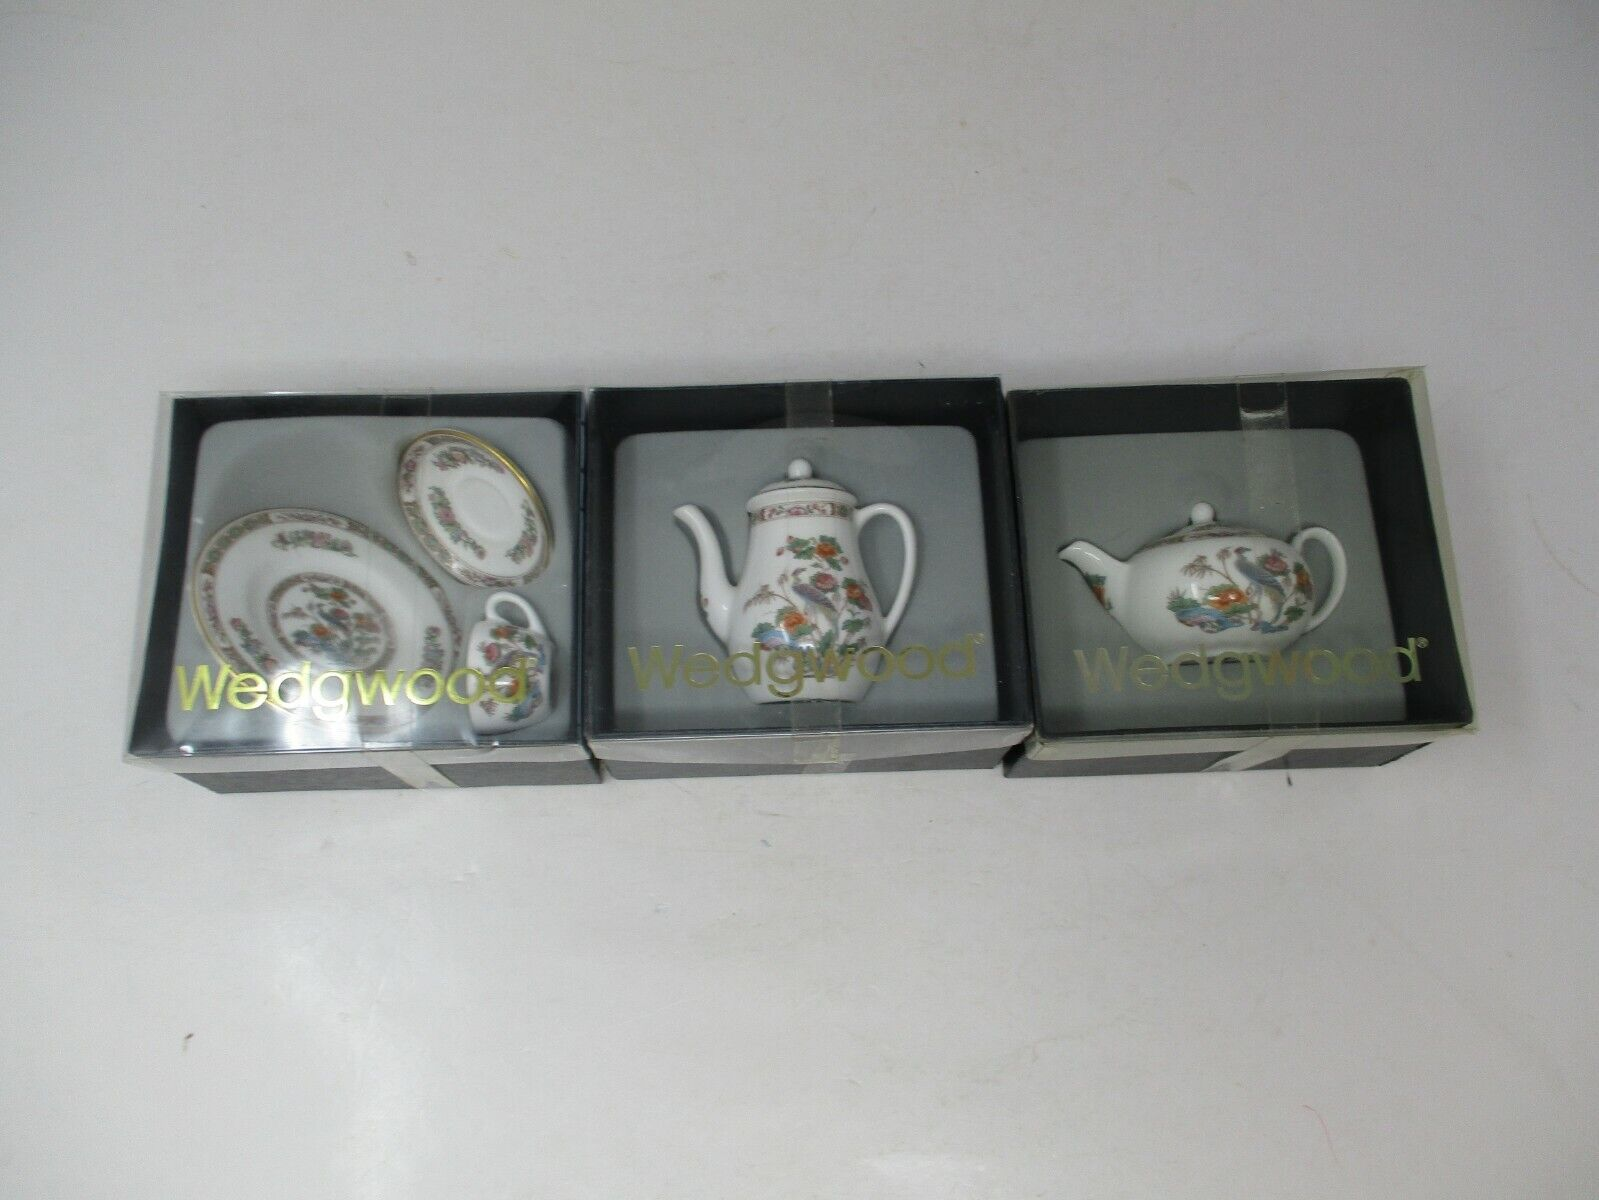 3 Wedgwood Kutani Crane Mini Sets w/ Original Boxes (R4682)